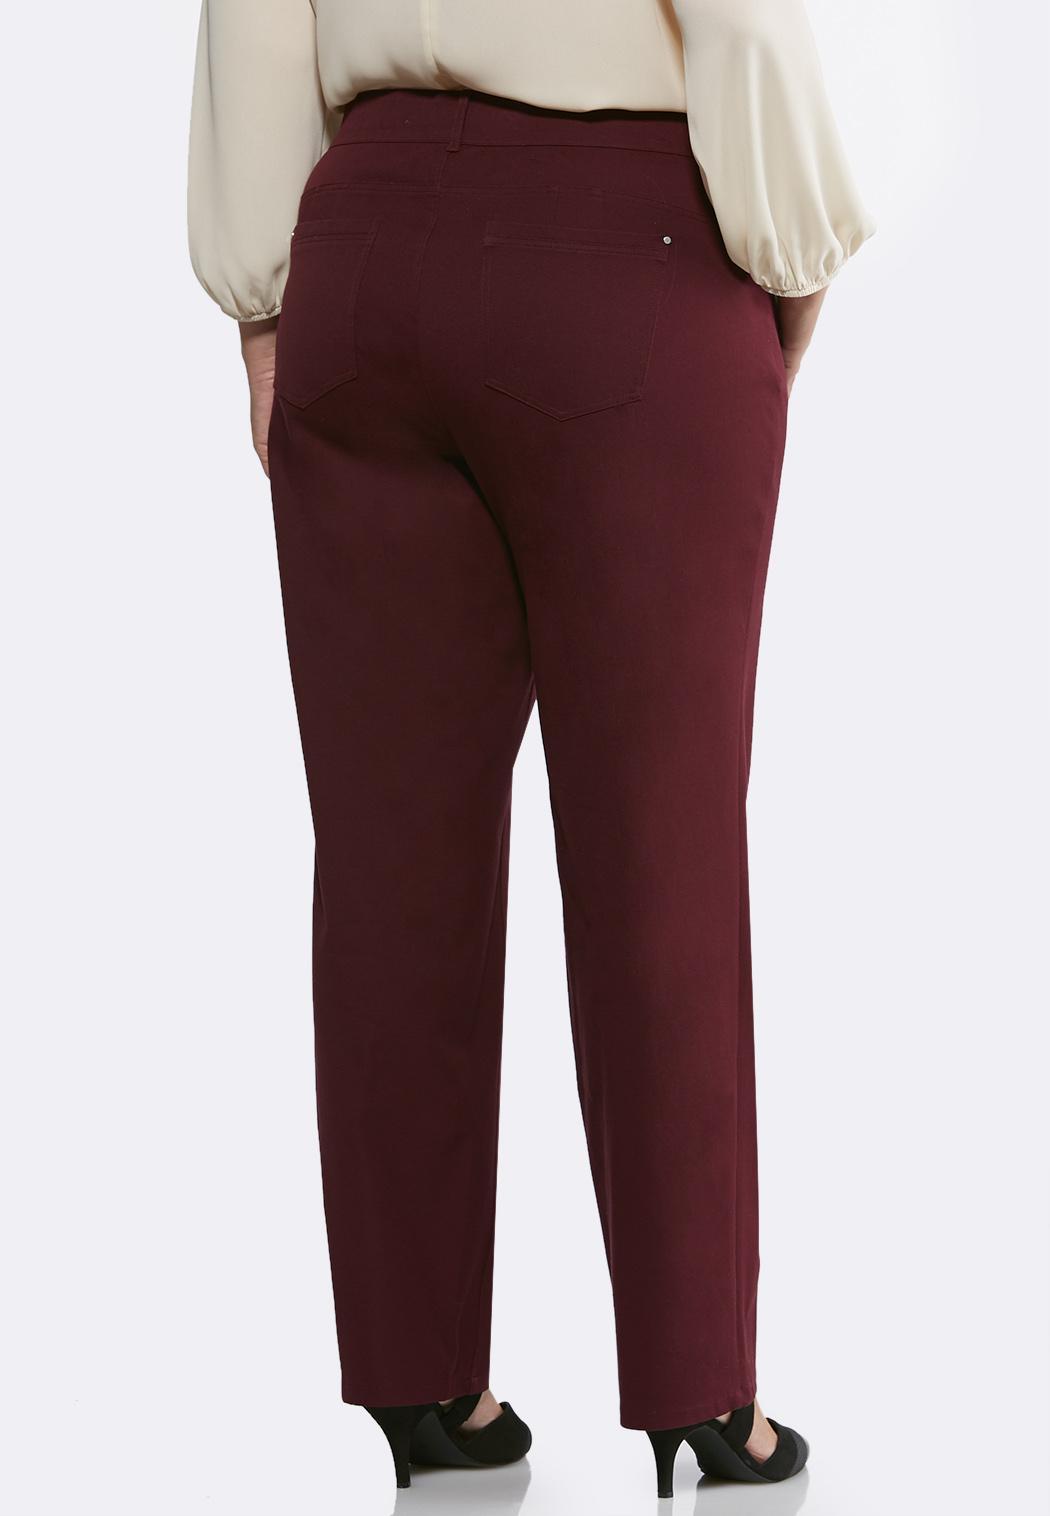 Plus Size Curvy Everywhere Pants (Item #43956289)